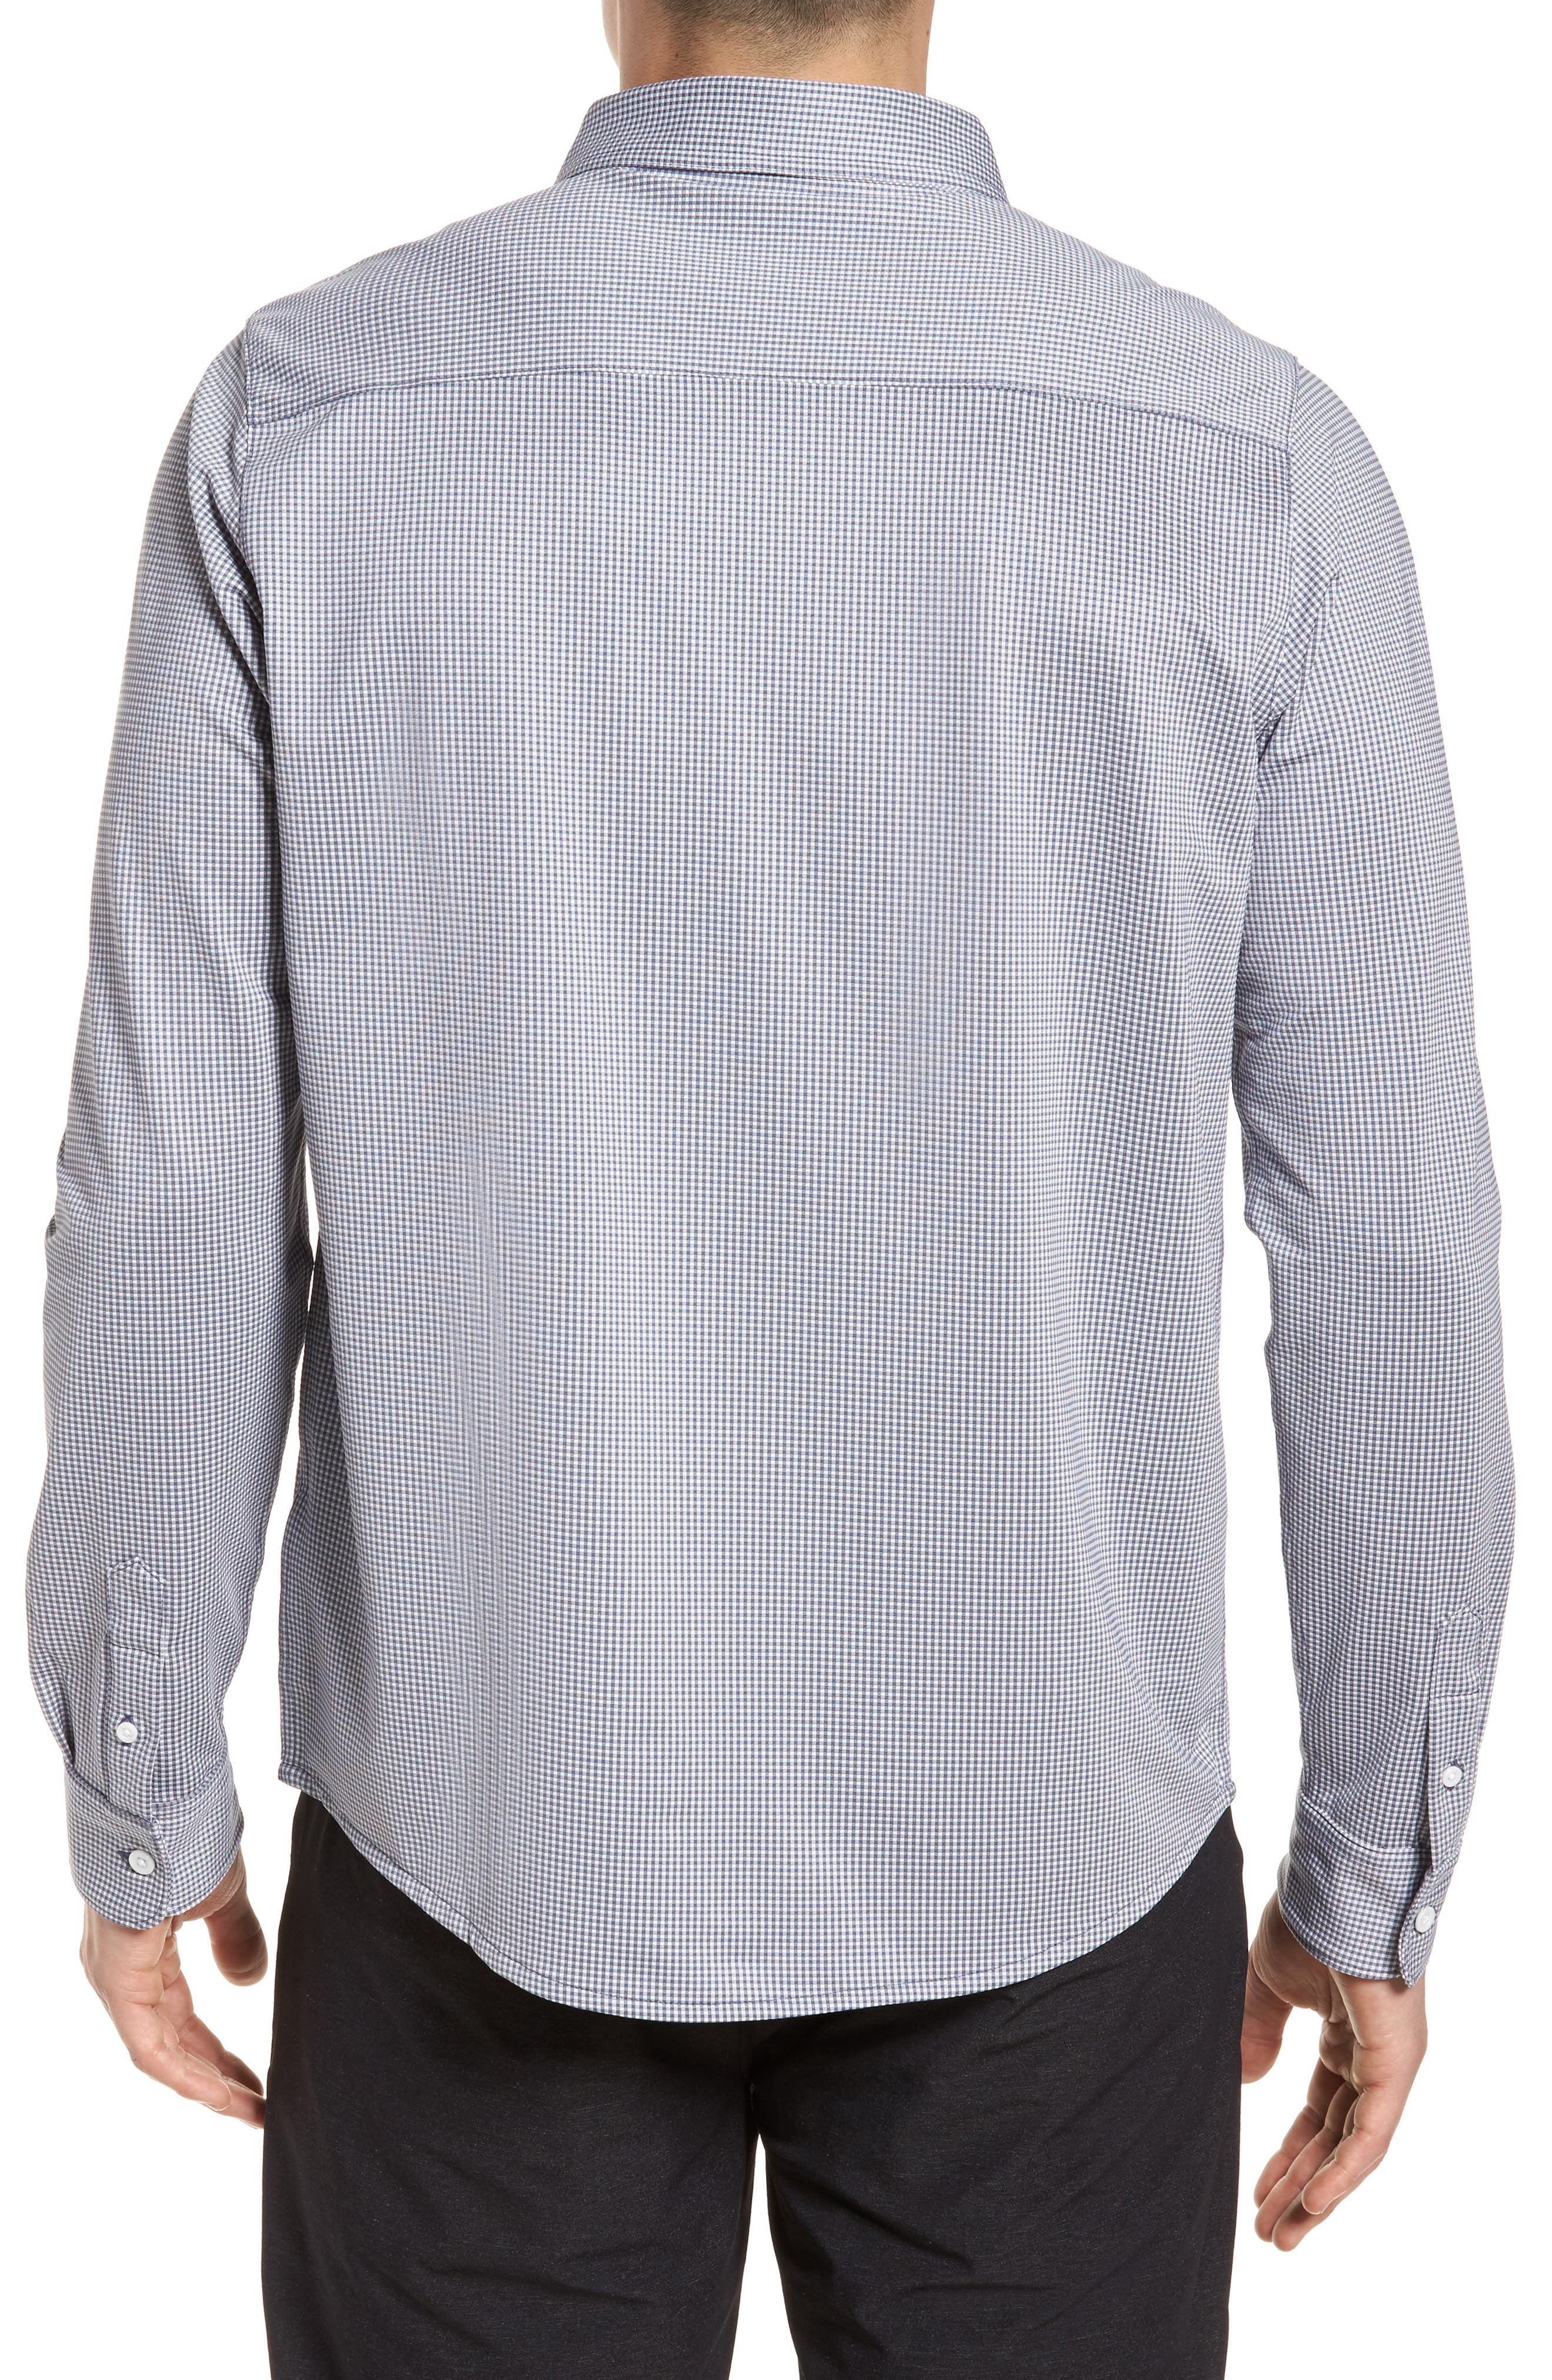 TRAVIS MATHEW,                             Couig Gingham Sport Shirt,                             Alternate thumbnail 2, color,                             105